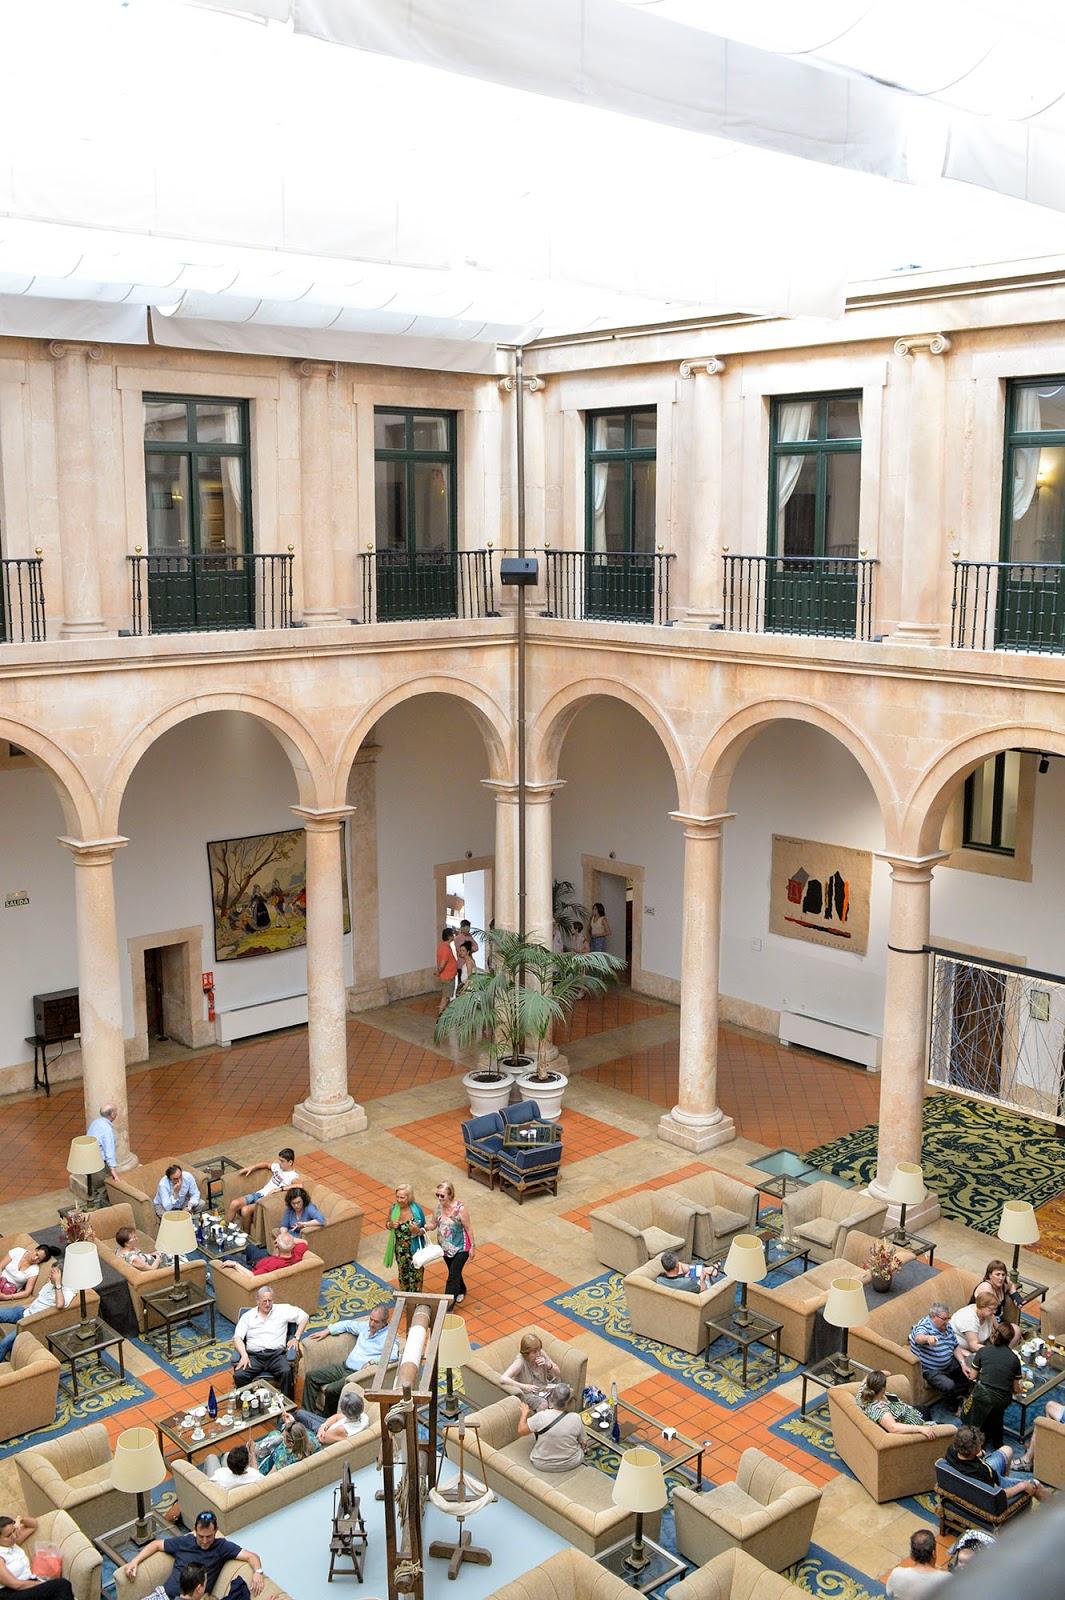 lerma burgos spain castile leon parador hotel ducal palace beautiful village